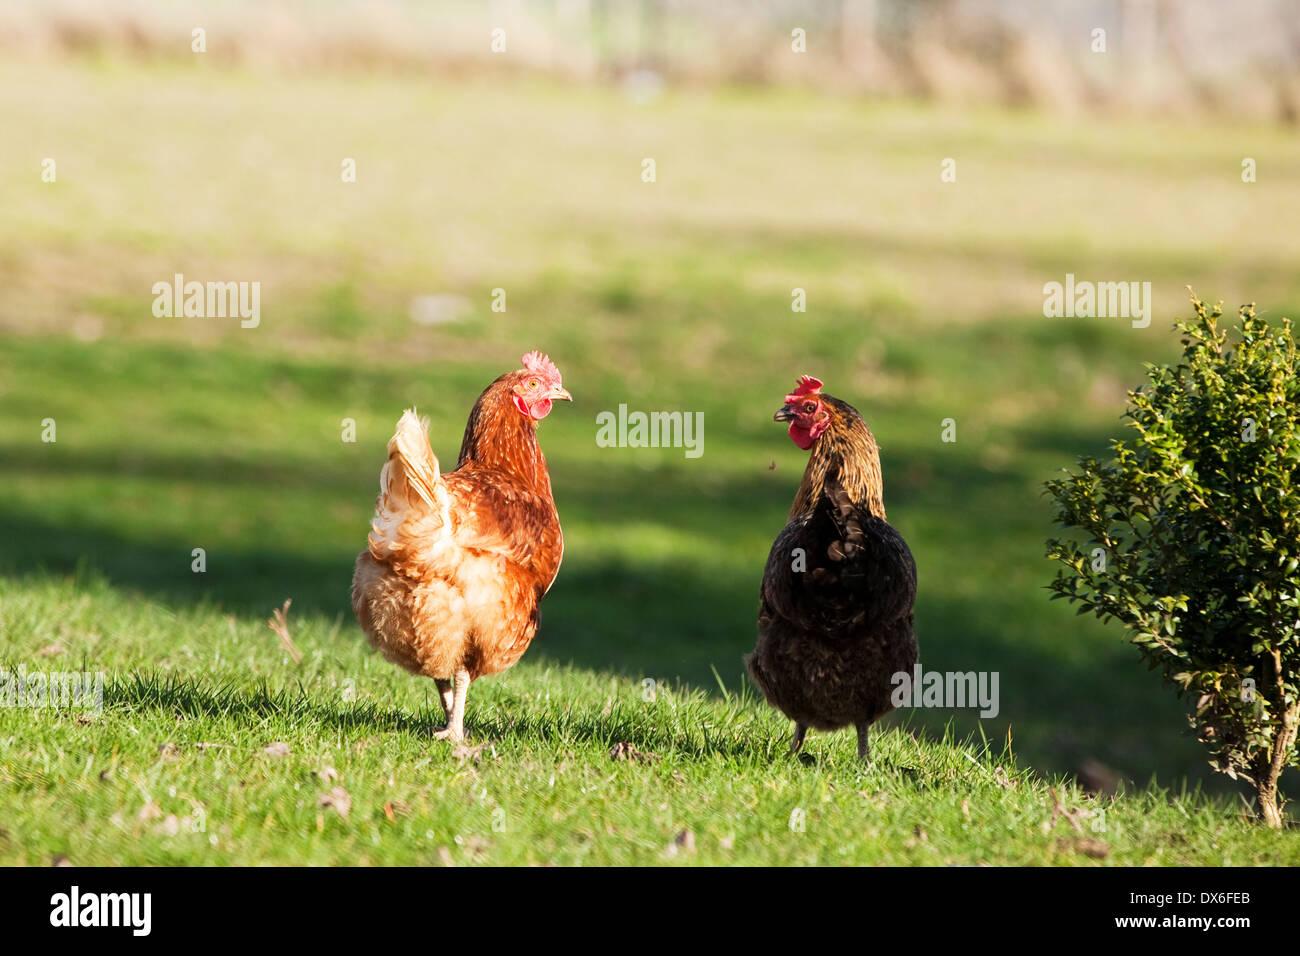 Free-range hens roaming free in English countryside - Stock Image